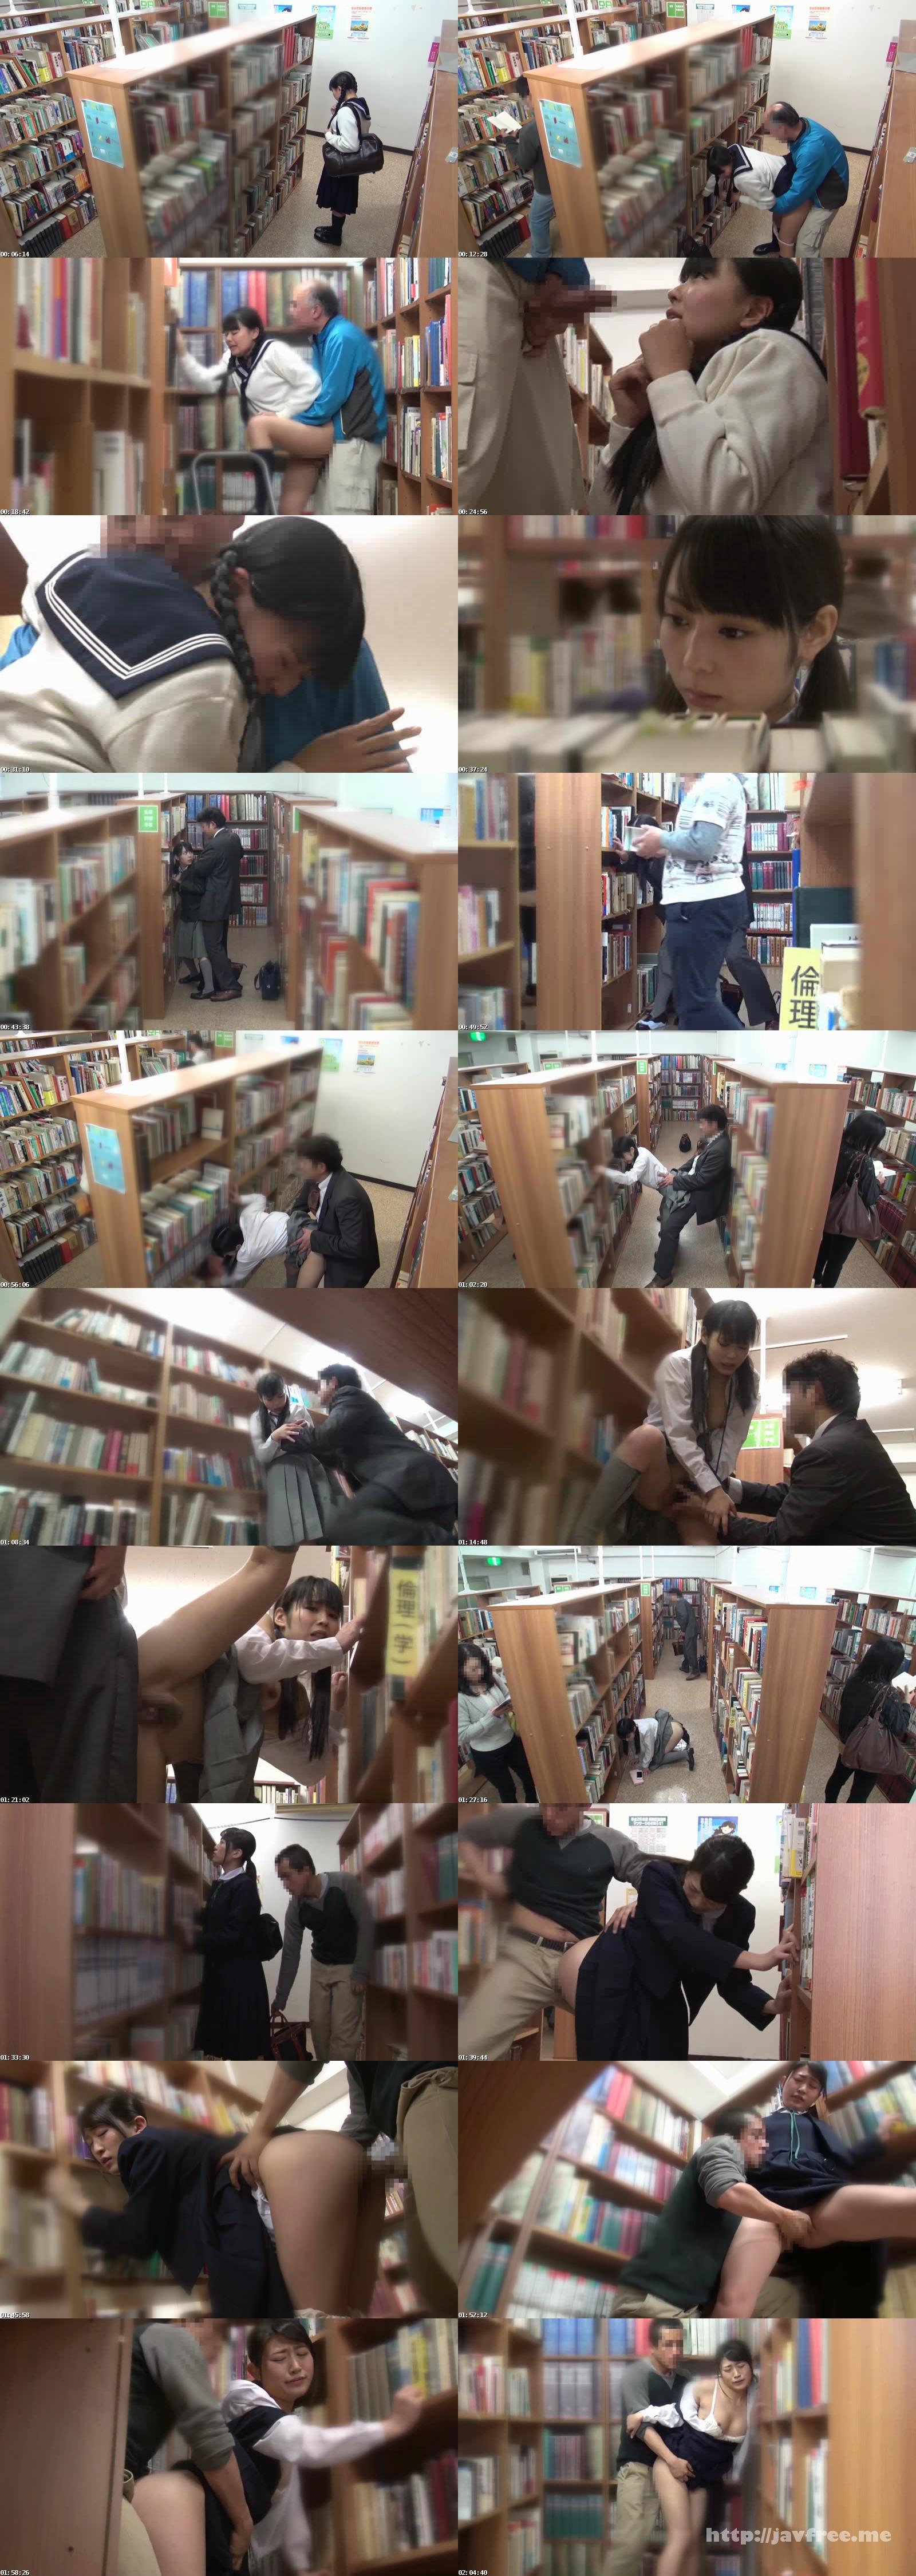 [DVDES 823] 公共施設で突然の強制わいせつ 声を出せない挿れっぱなし図書館 真面目な女子校生の未成熟なキツマンにデカチン即ハメ!合体したまま館内連れ回し!長時間挿入でガマンできずに無念の発情潮!! DVDES